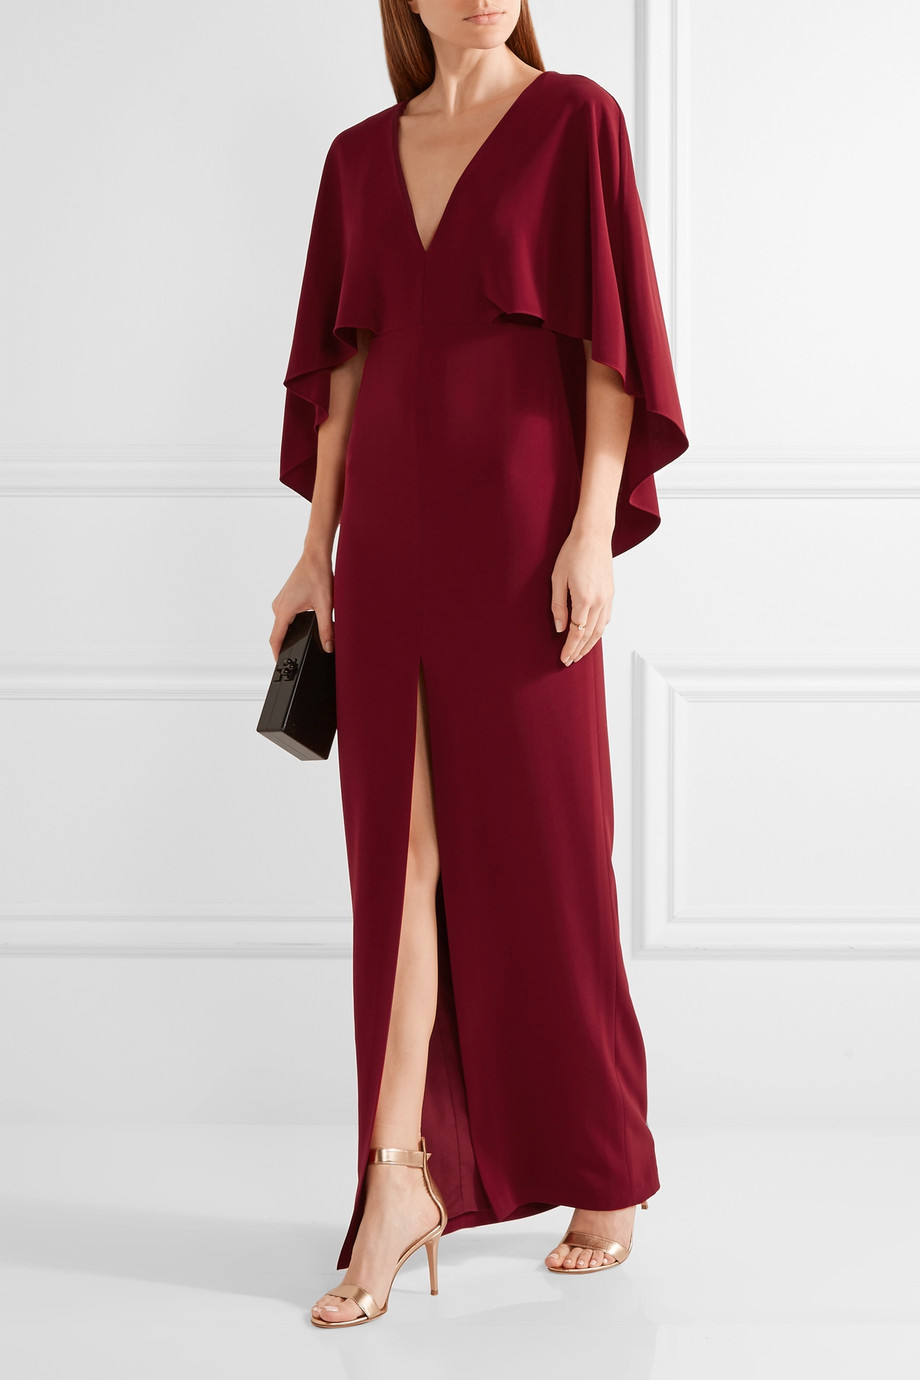 Wedding ideas 25 wedding guest dresses you 39 ll love for Maroon wedding guest dress